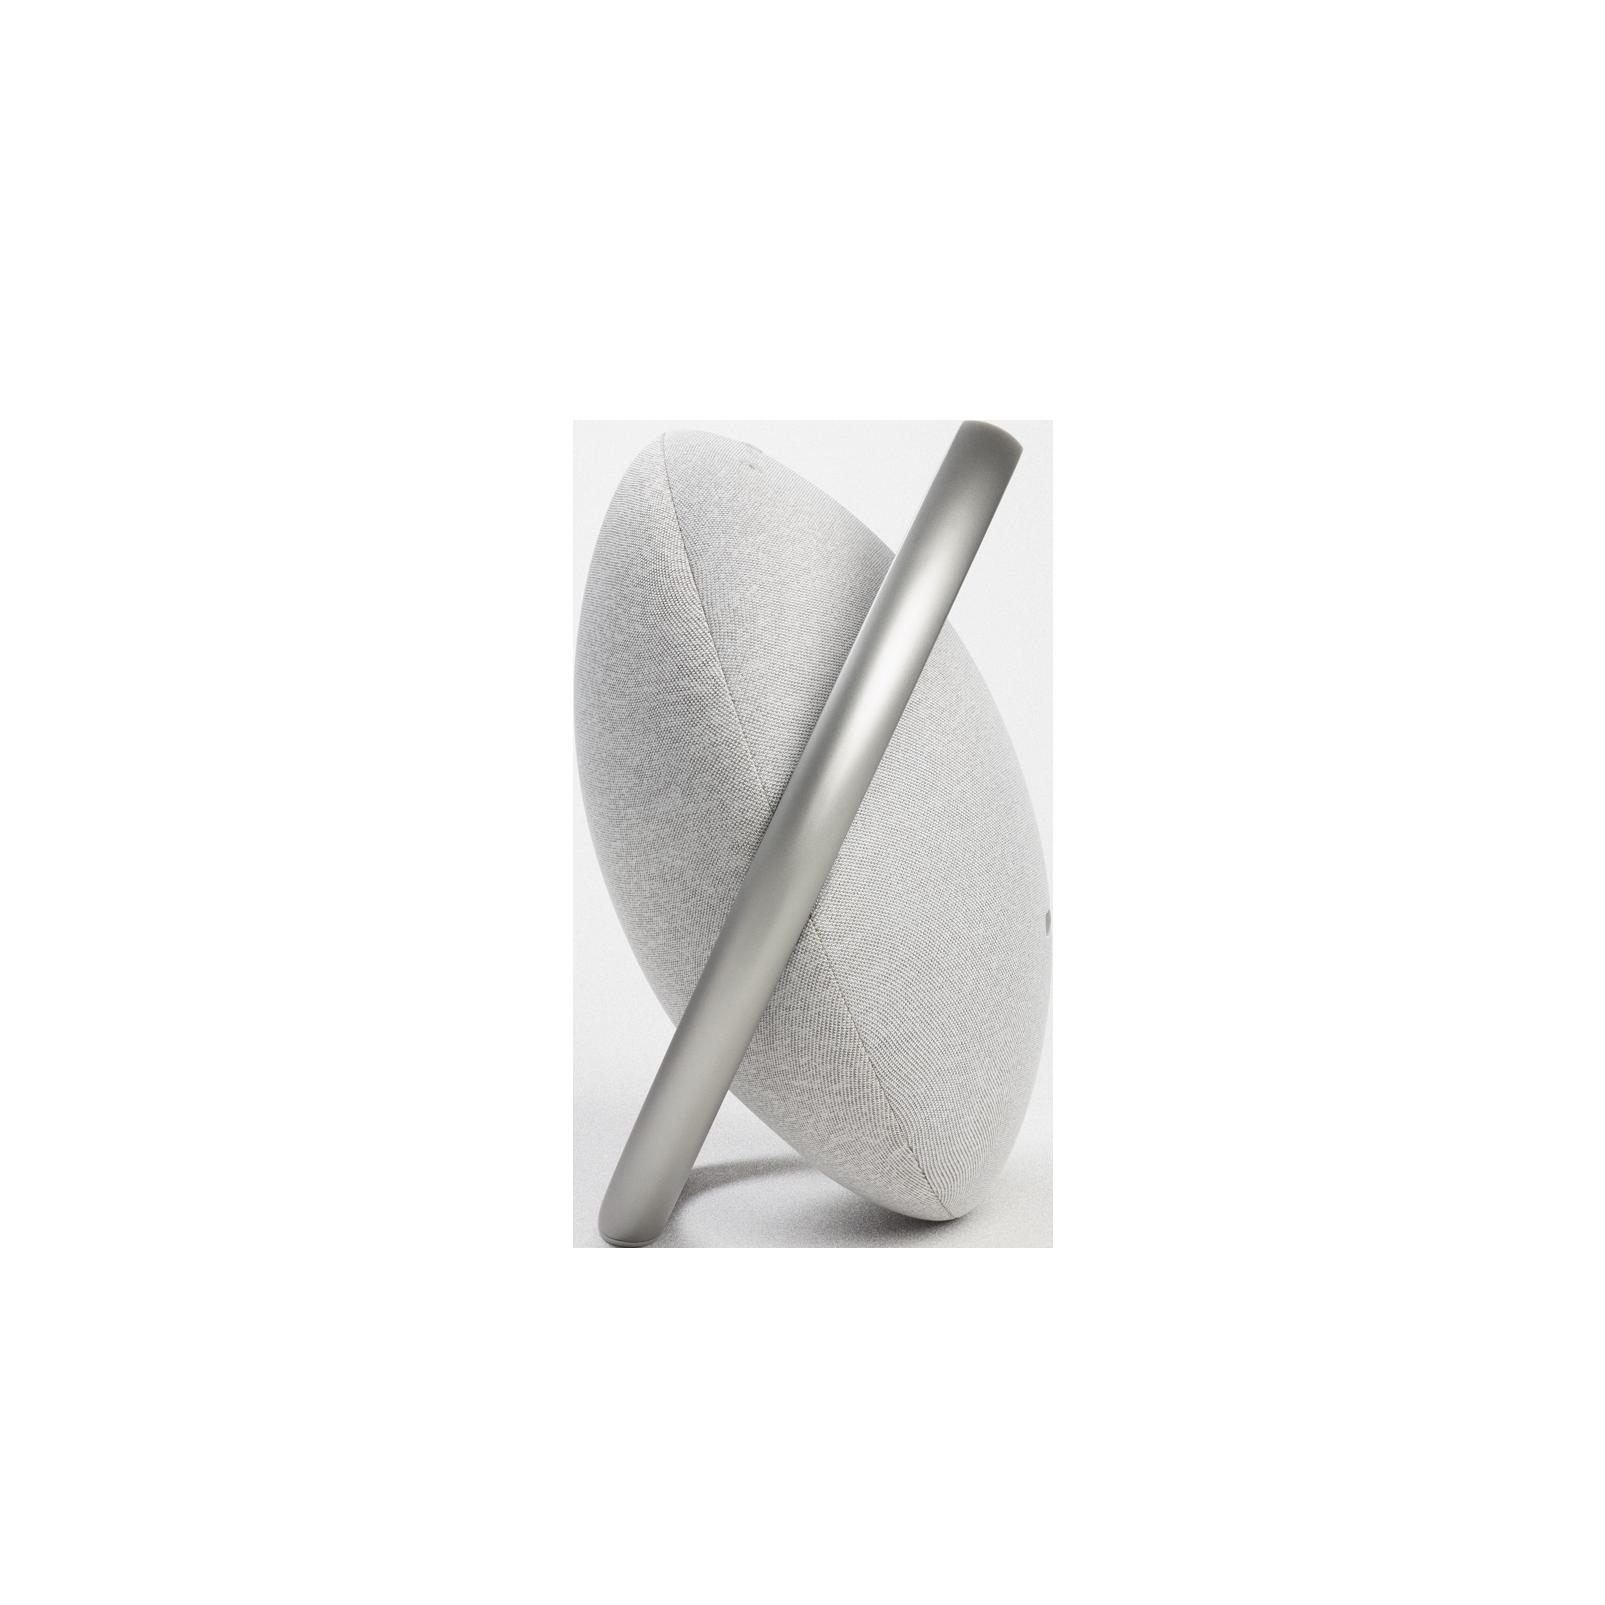 Onyx Studio 7 - Grey - Portable Stereo Bluetooth Speaker - Right